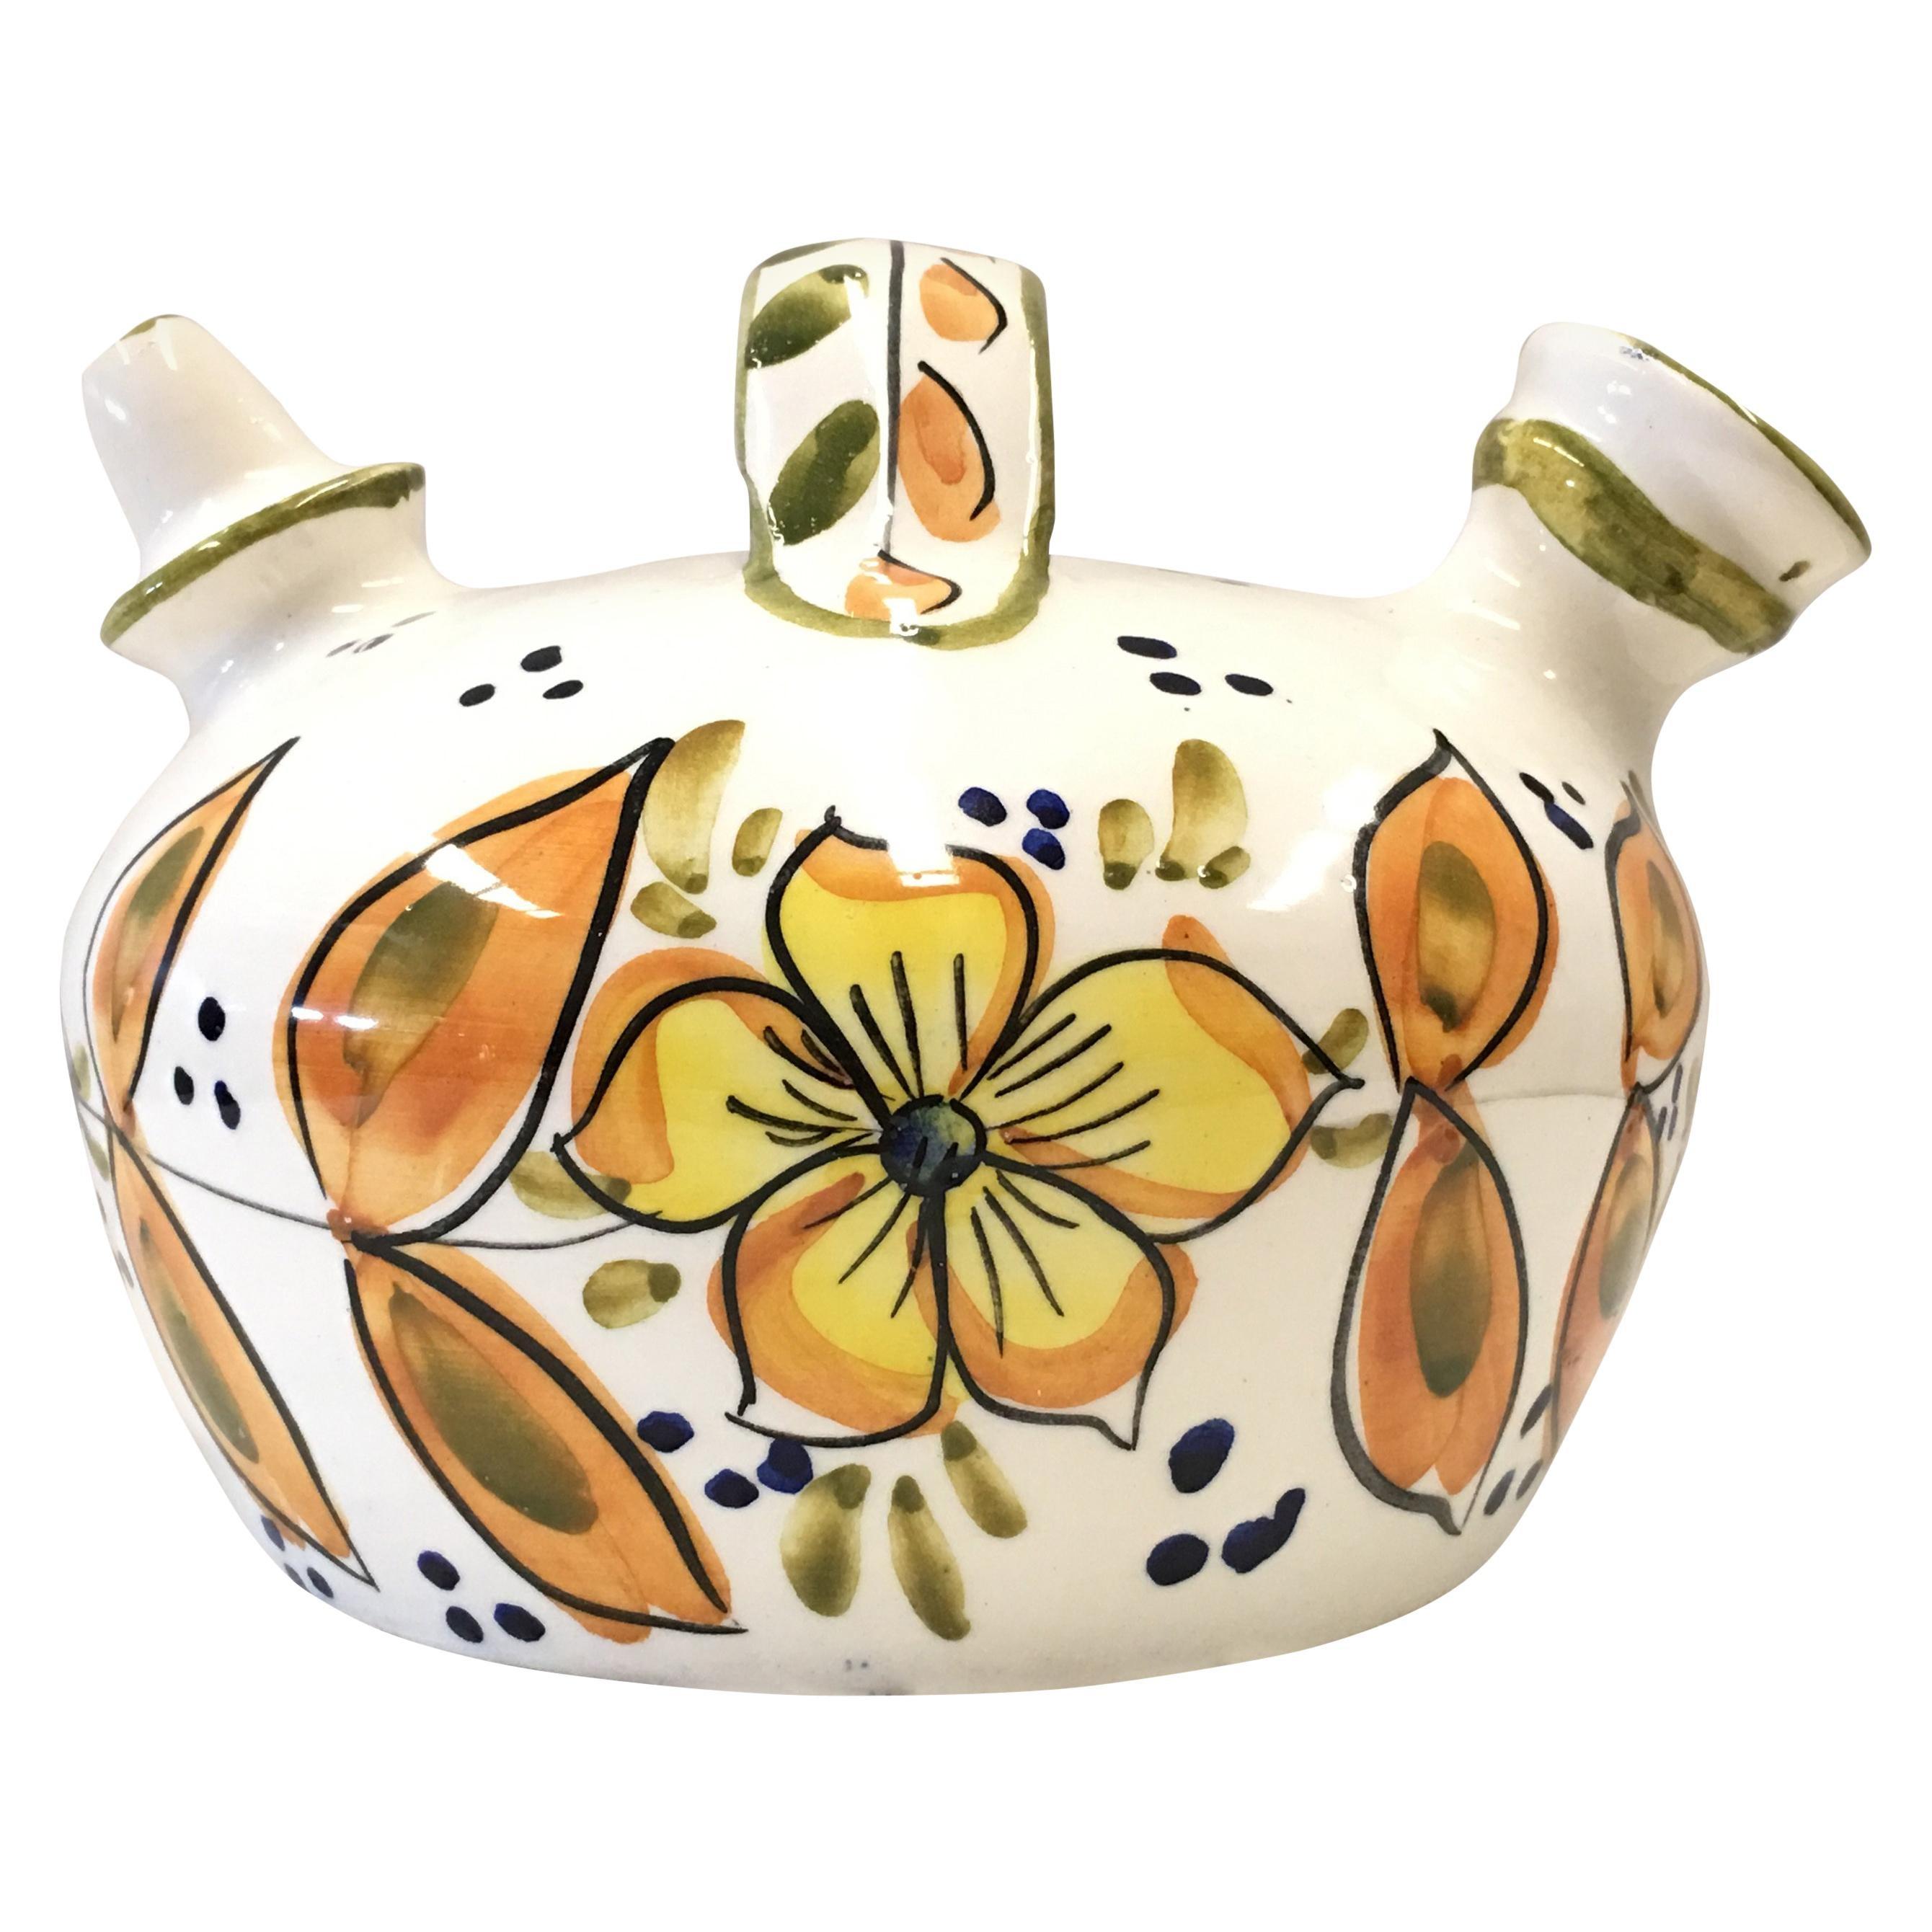 20th Century Spanish Glazed Cruche or Pitcher